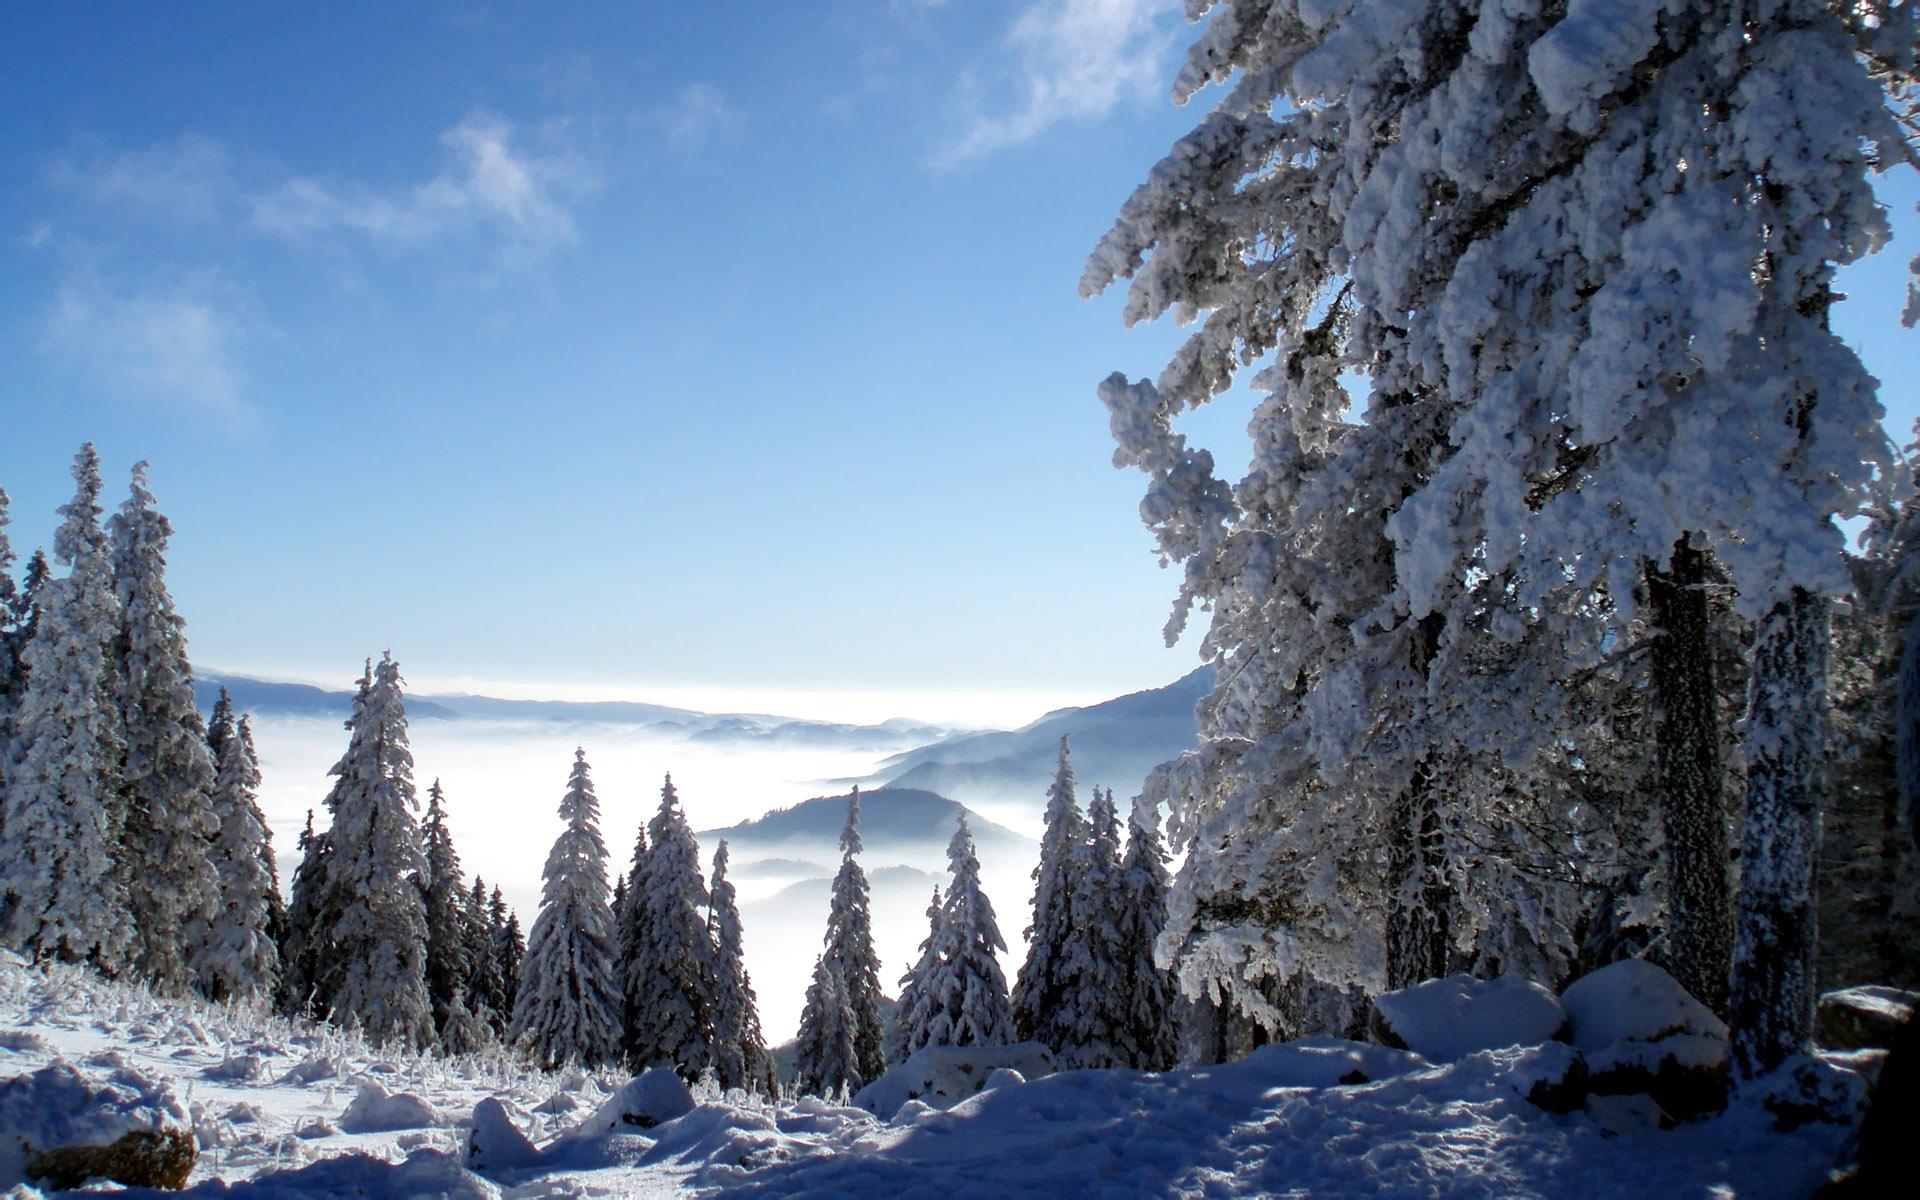 snowy trees free